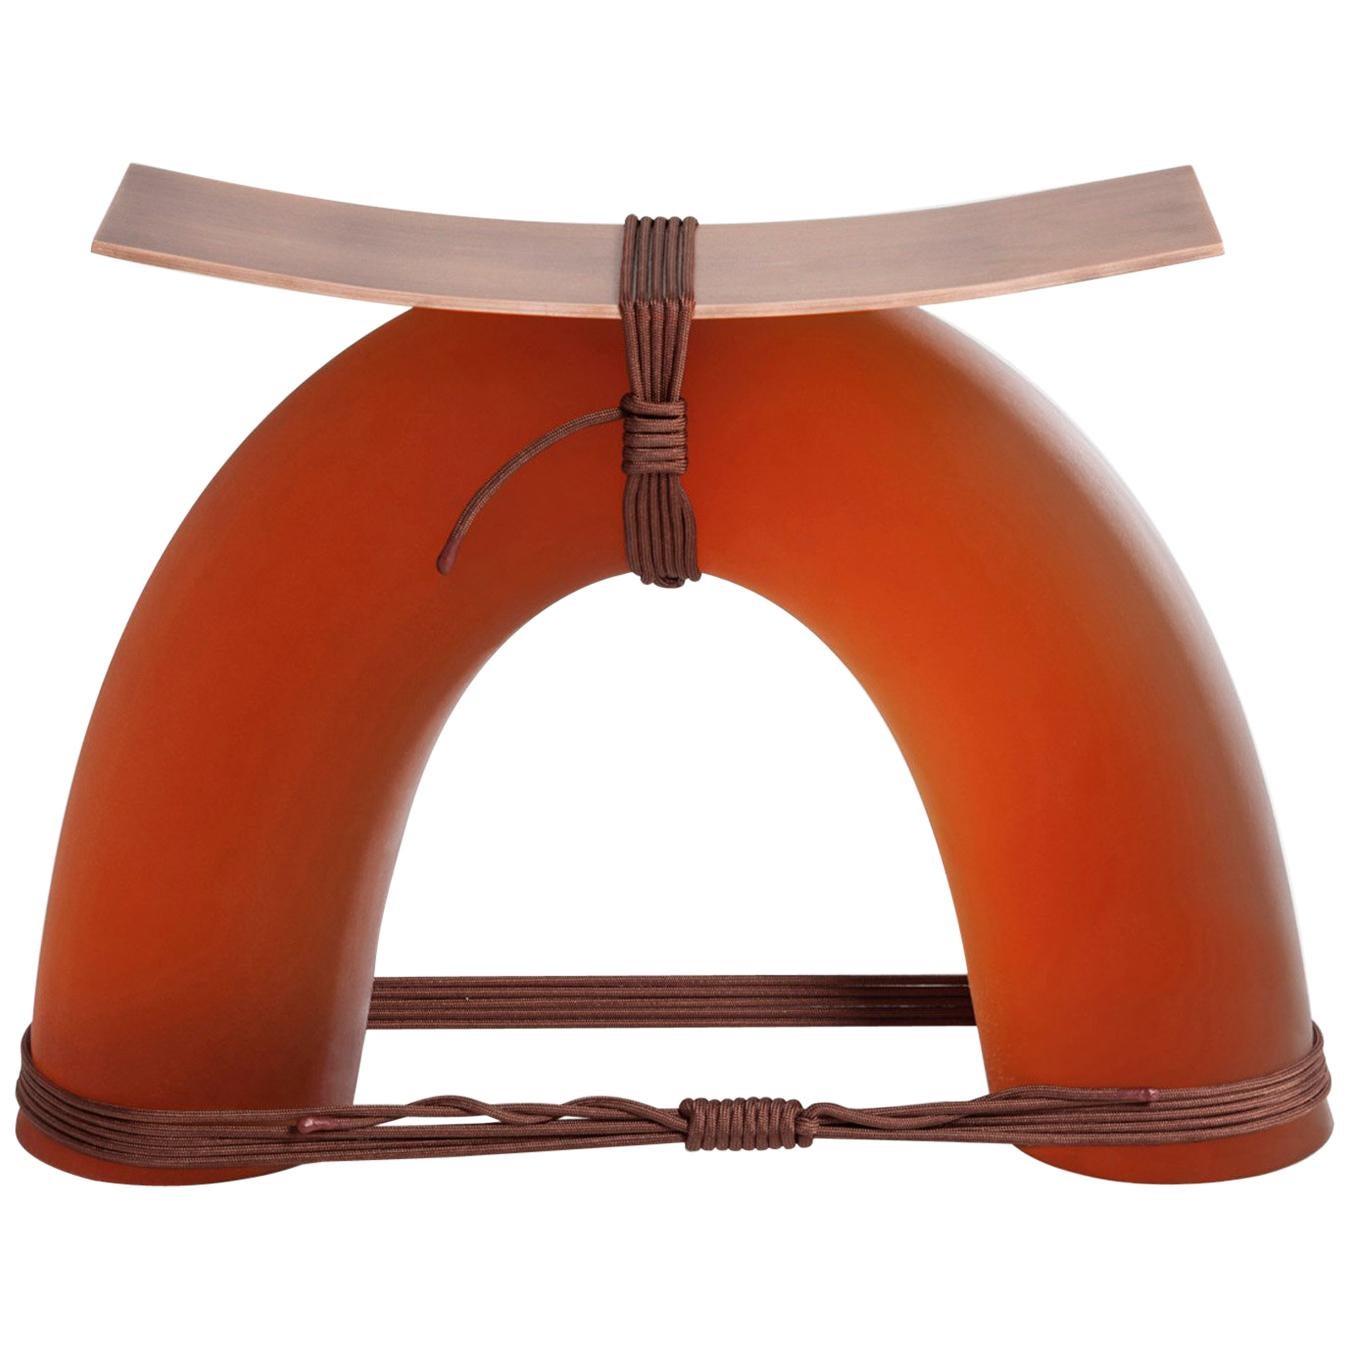 Equilibrium Stool in Copper by Guglielmo Poletti